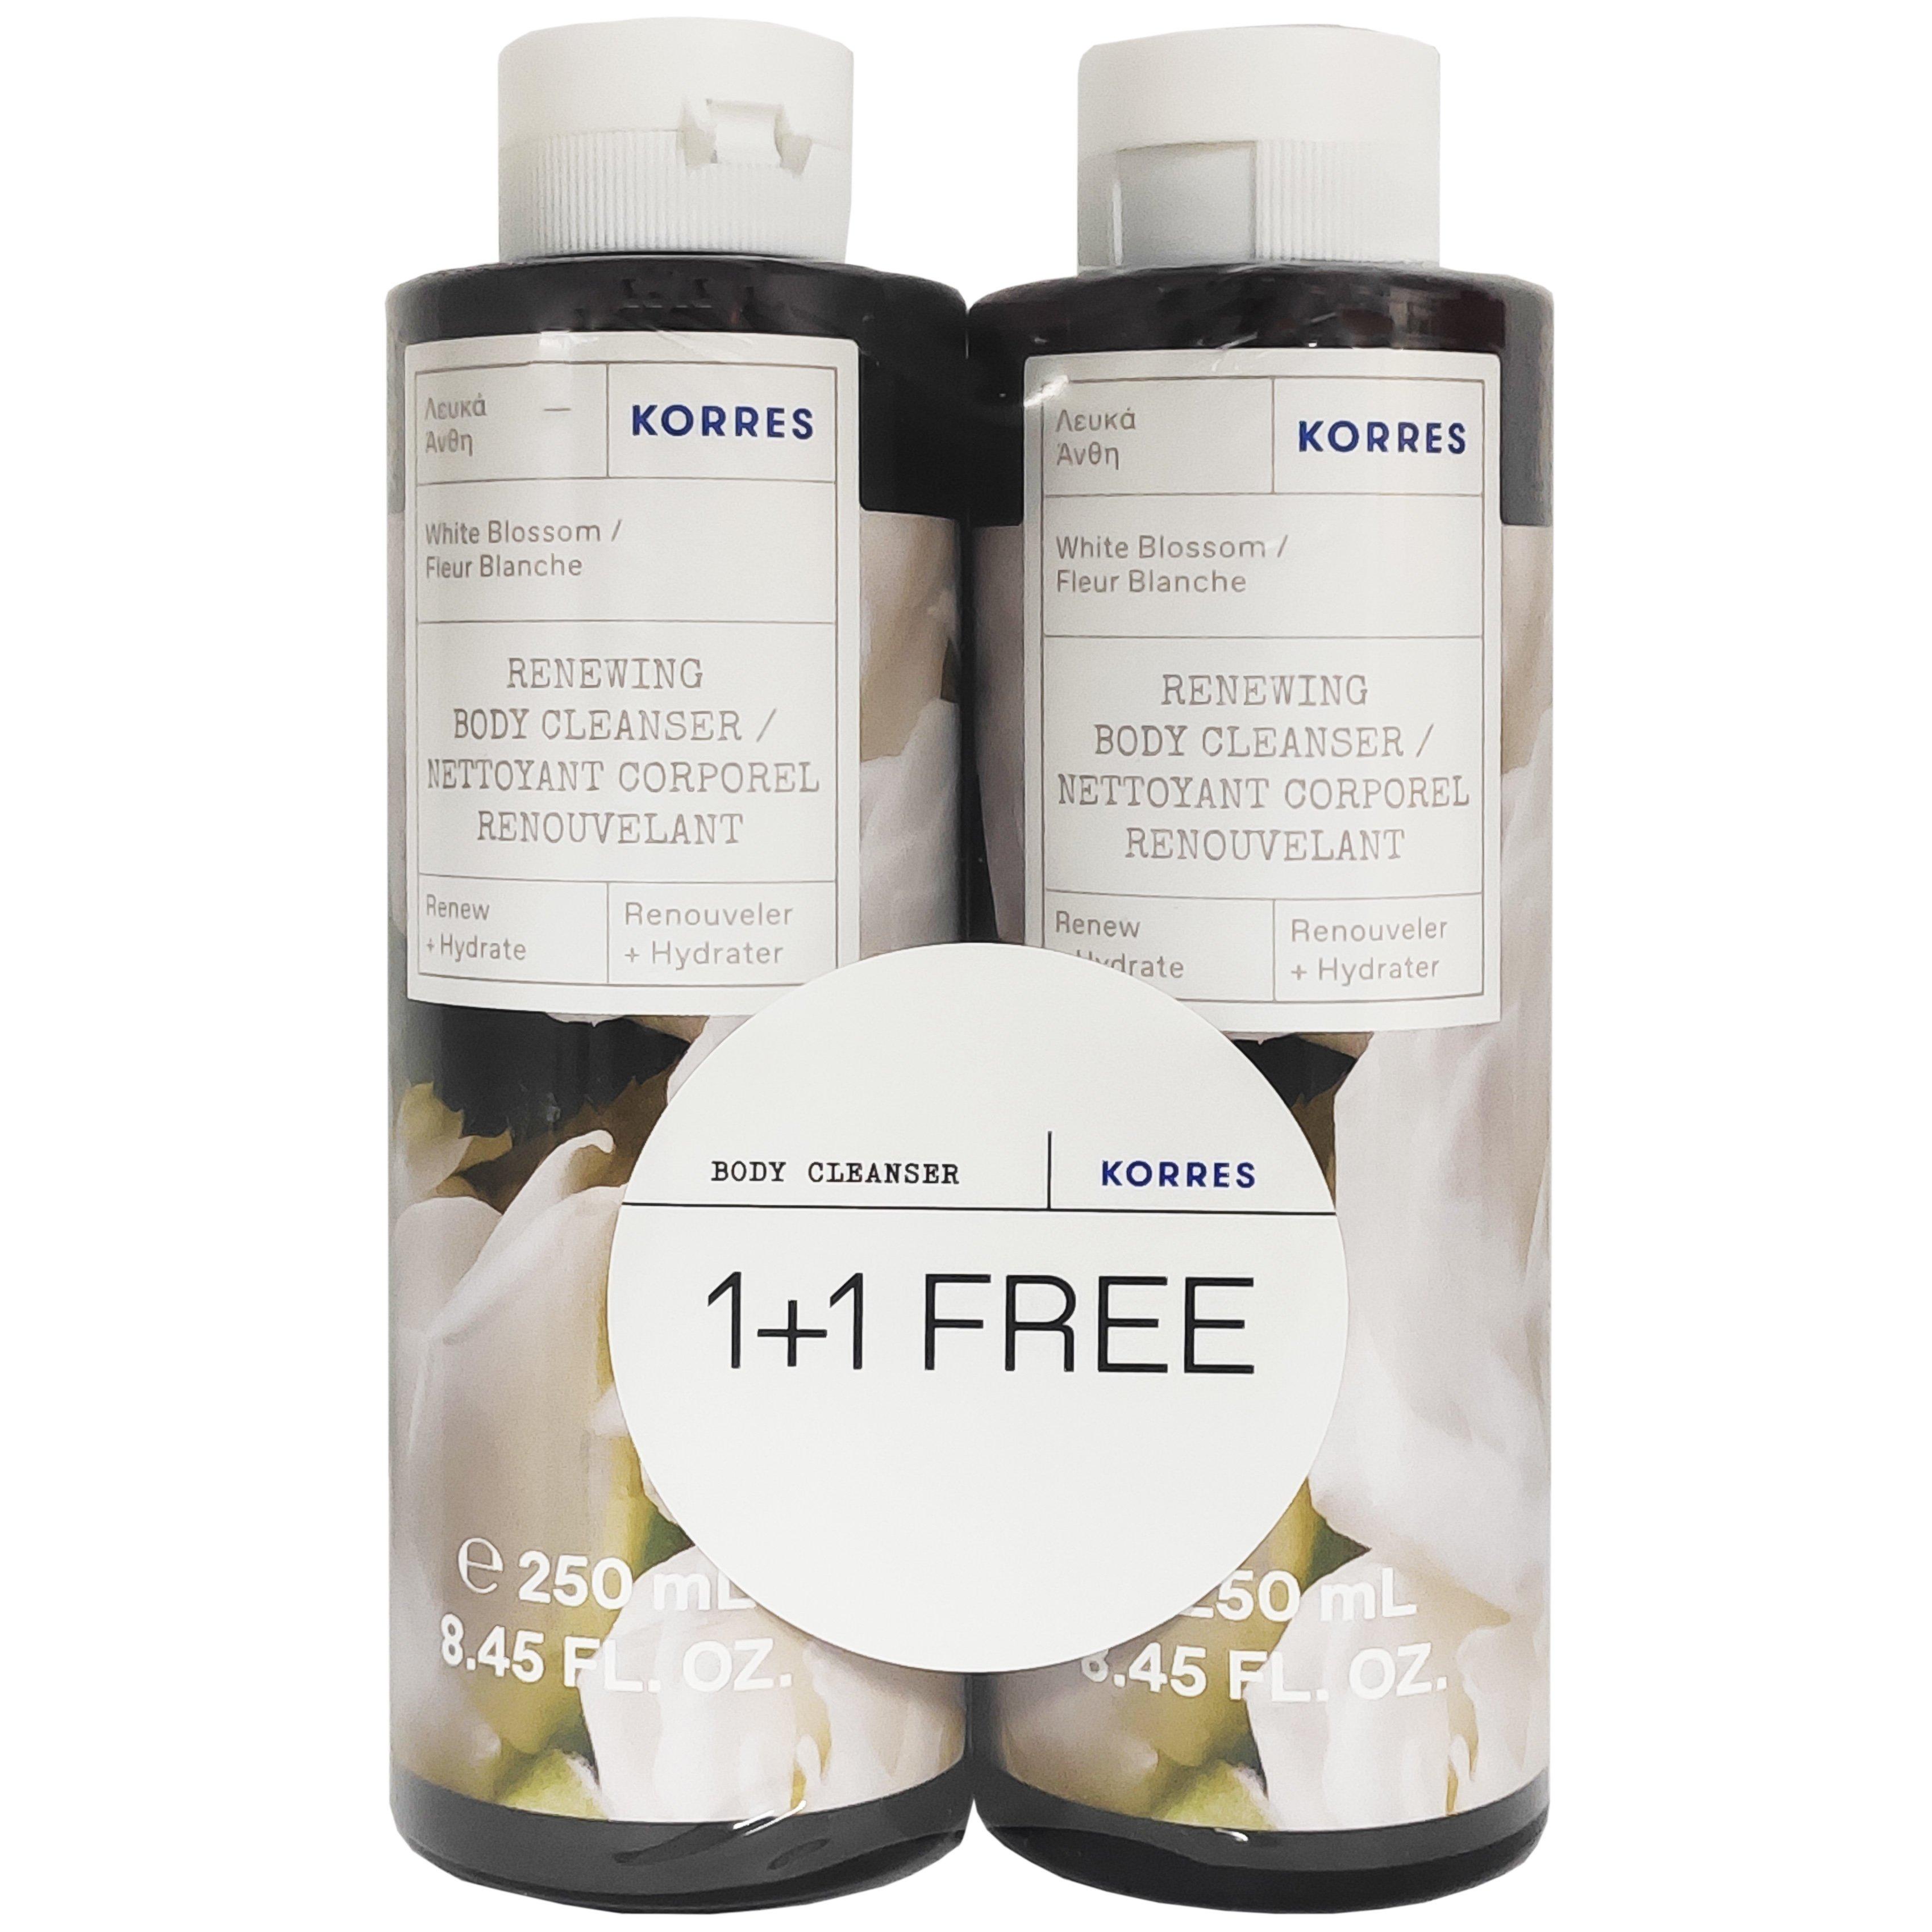 Korres Πακέτο Προσφοράς Showergel White Blossom Αφρόλουτρο με Νότες Από Λευκά Άνθη Περγαμόντο με Άρωμα Πούδρας 1+1 Δώρο 2x250ml